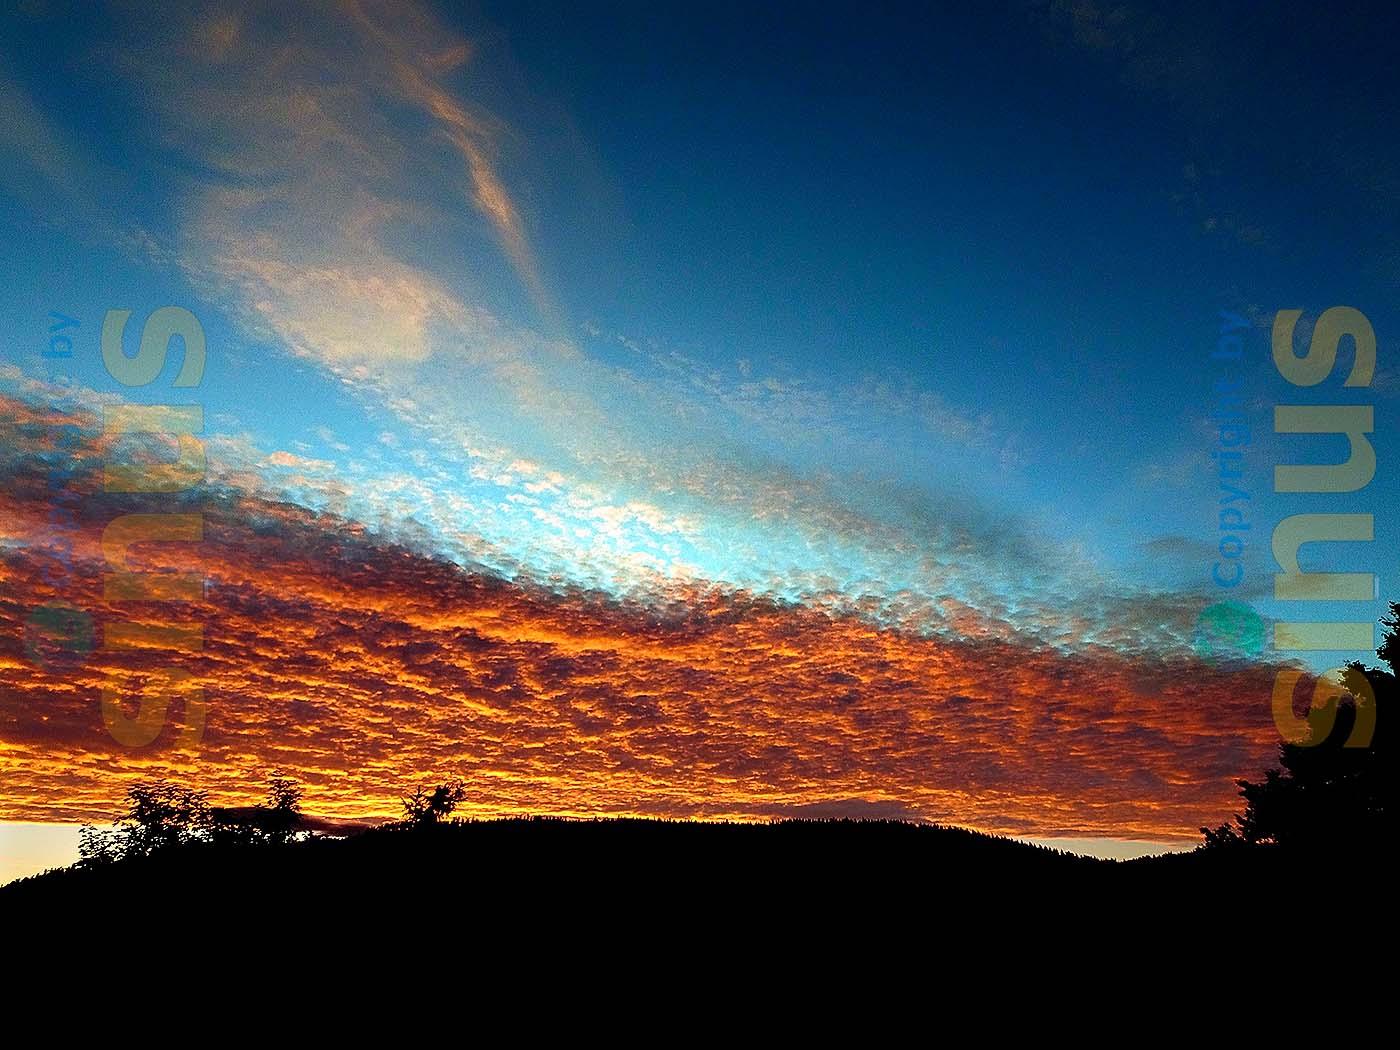 Wokenhimmel mit Abendsonne